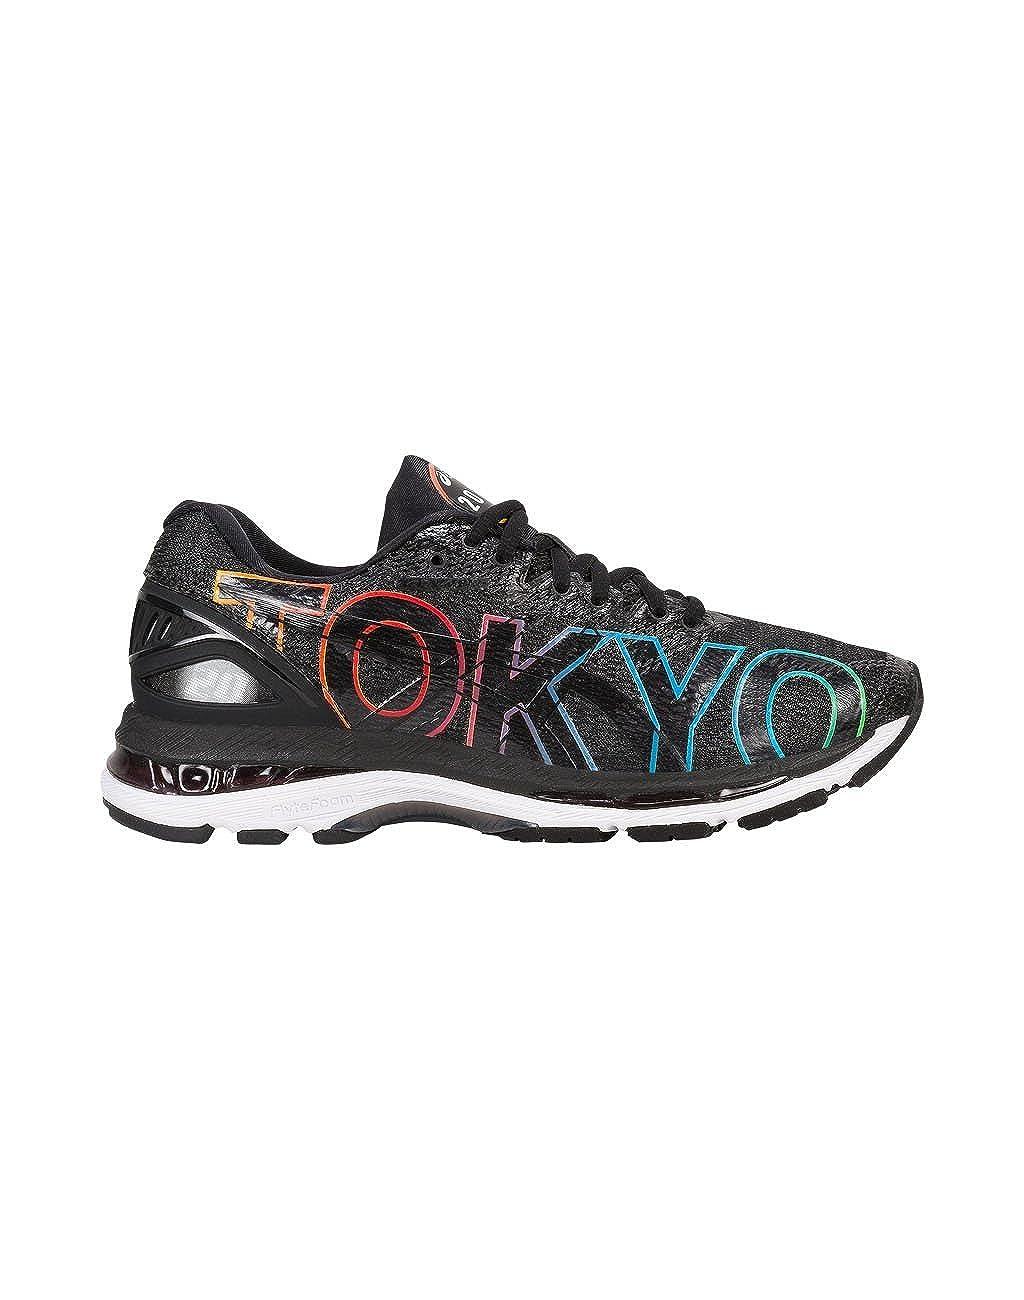 ASICS Gel-Nimbus 20 Tokyo Marathon Women s Running Shoes